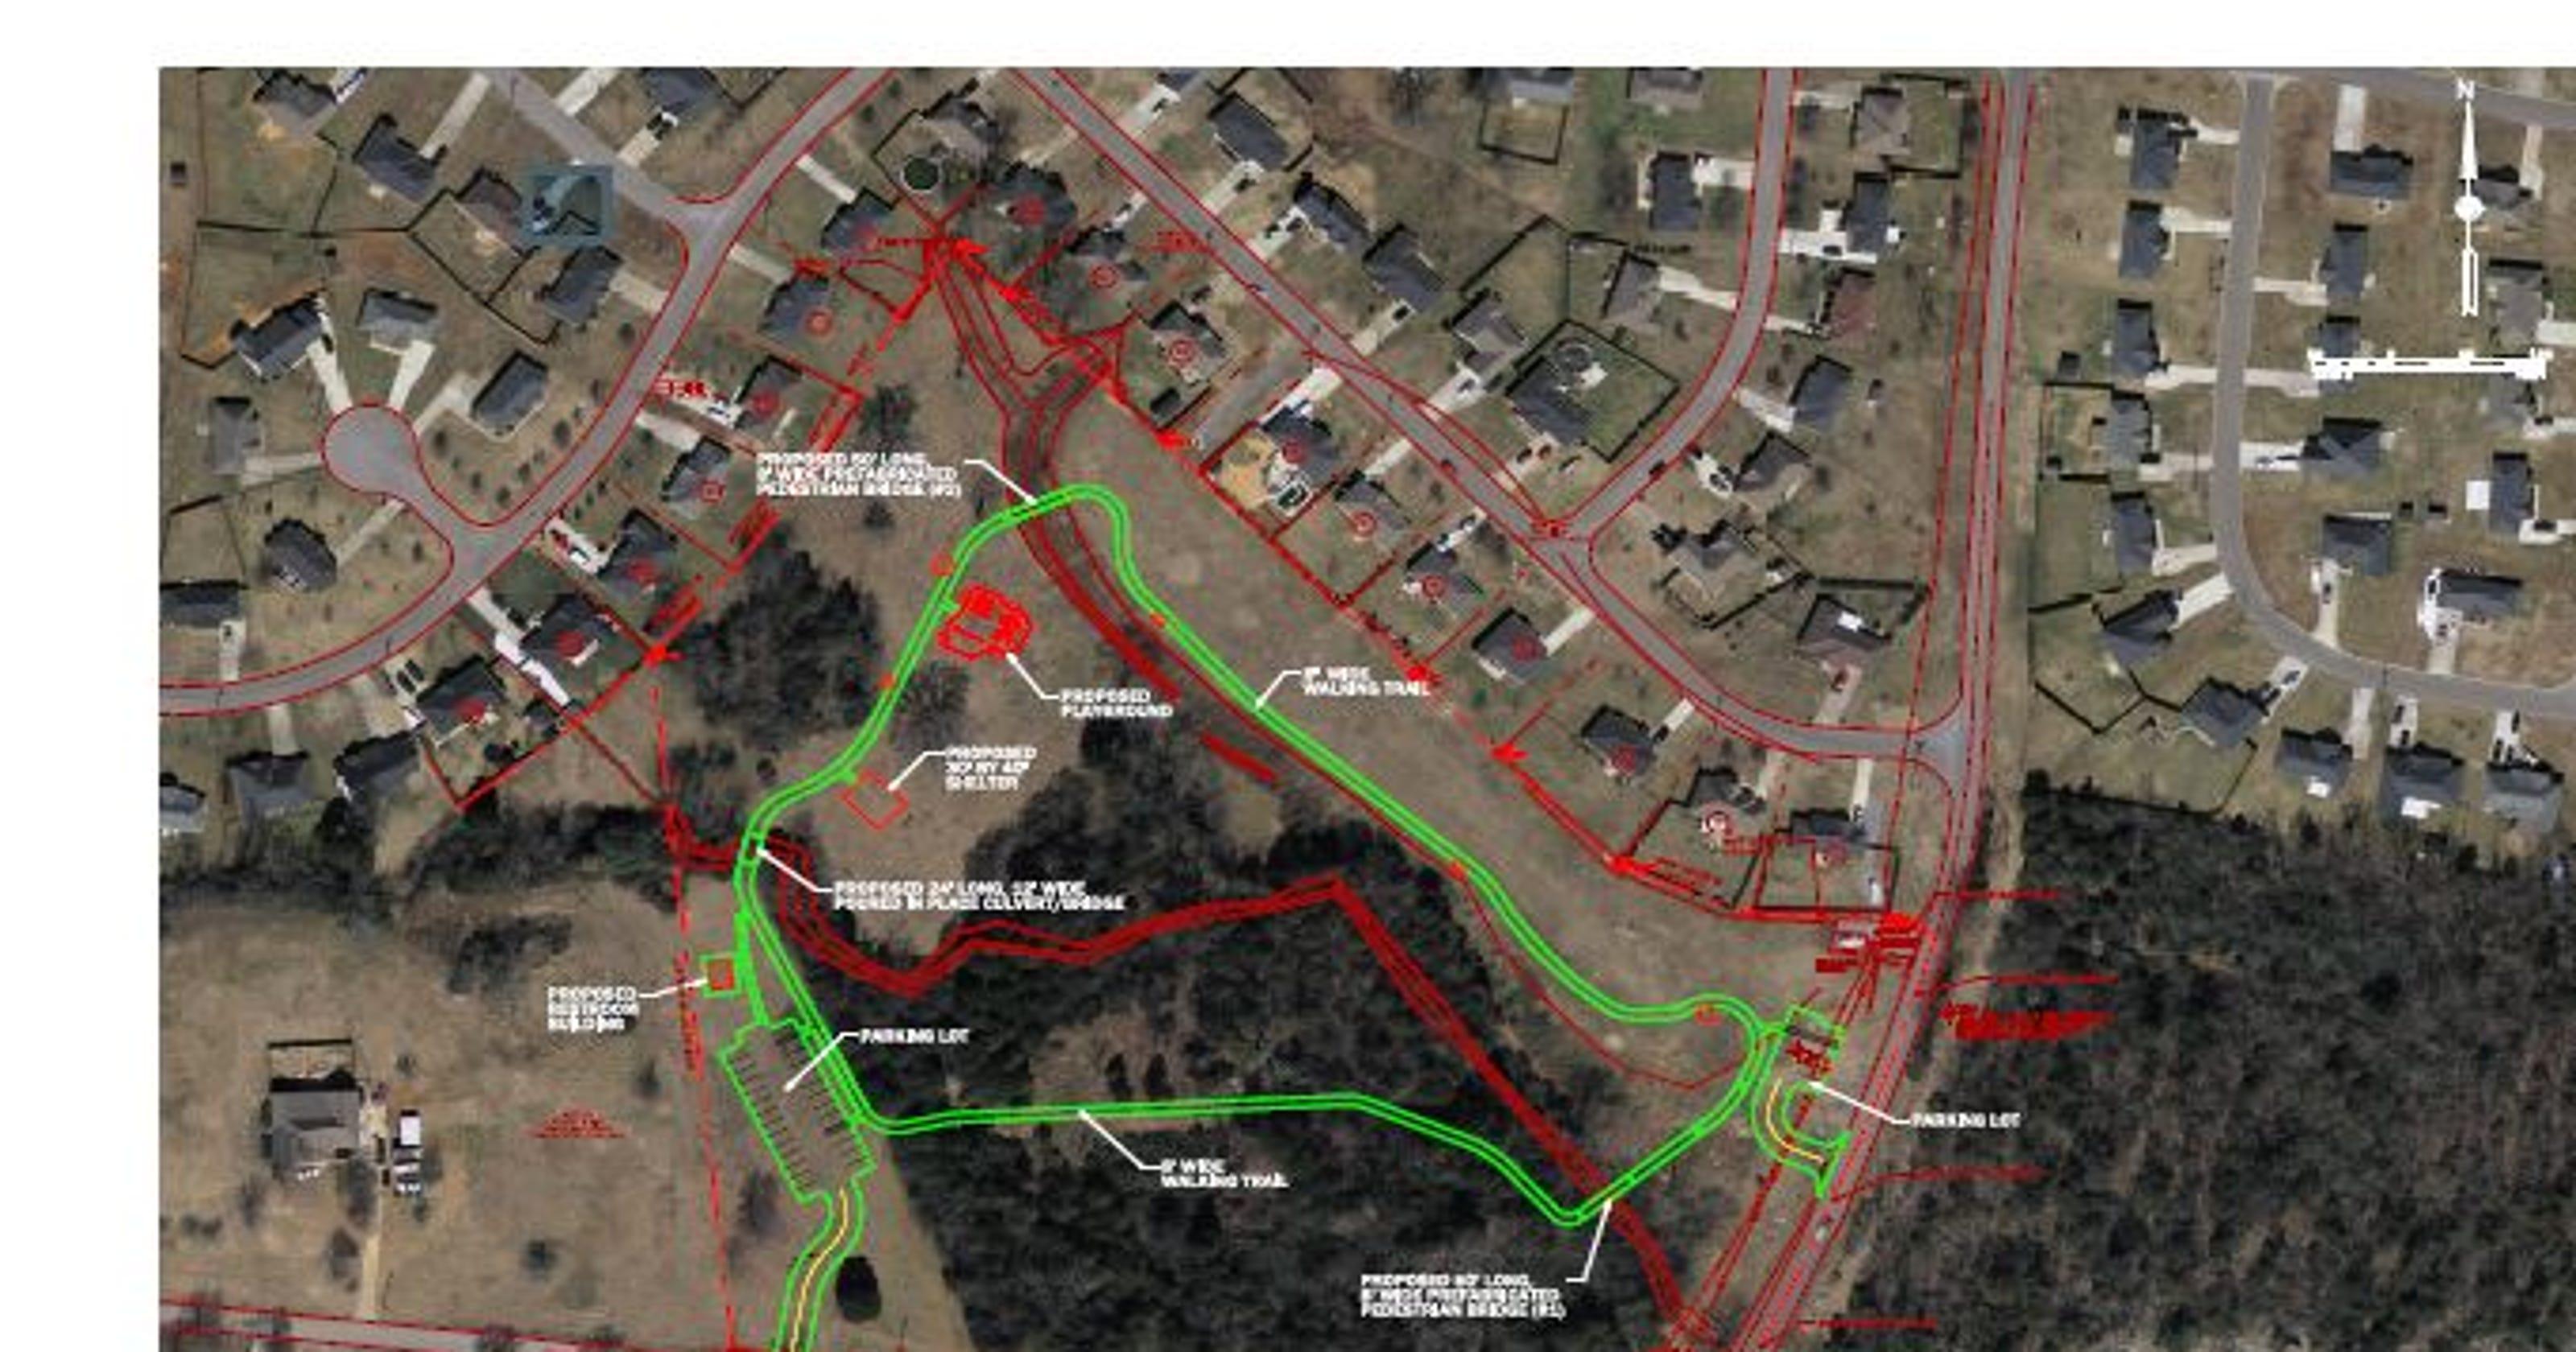 Smyrna to build park off Florence Road